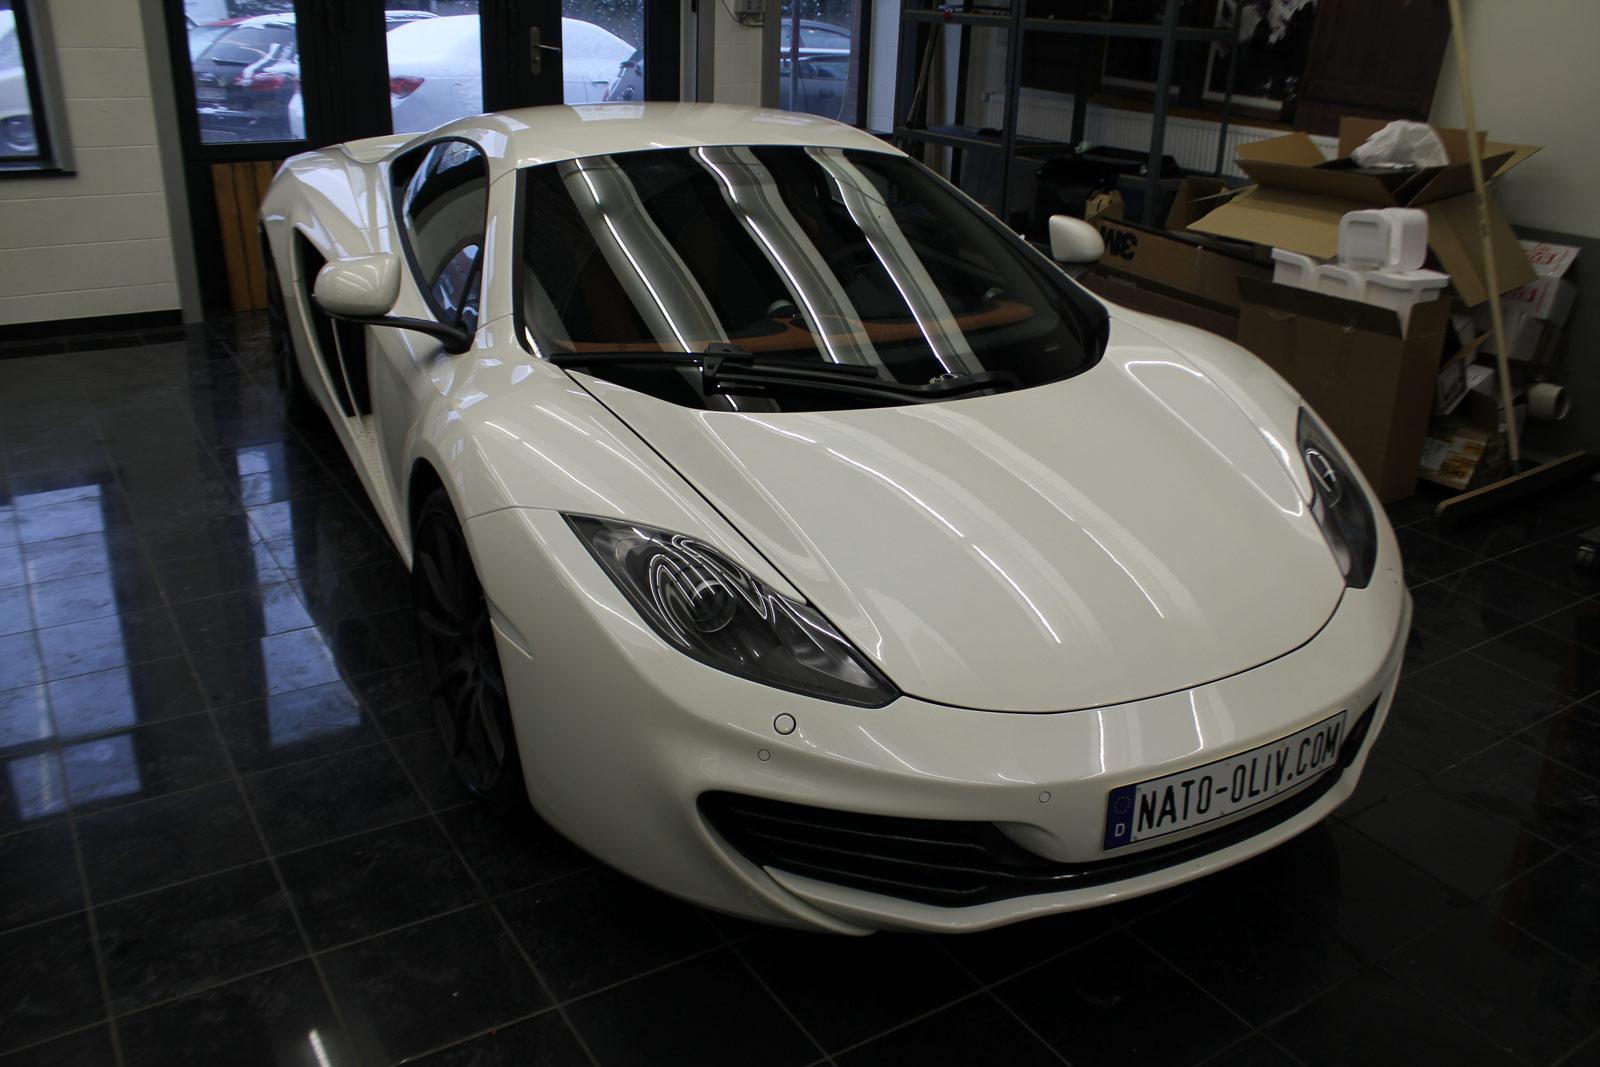 McLaren_Beklebung_Rallyestreifen_Schwarz_05